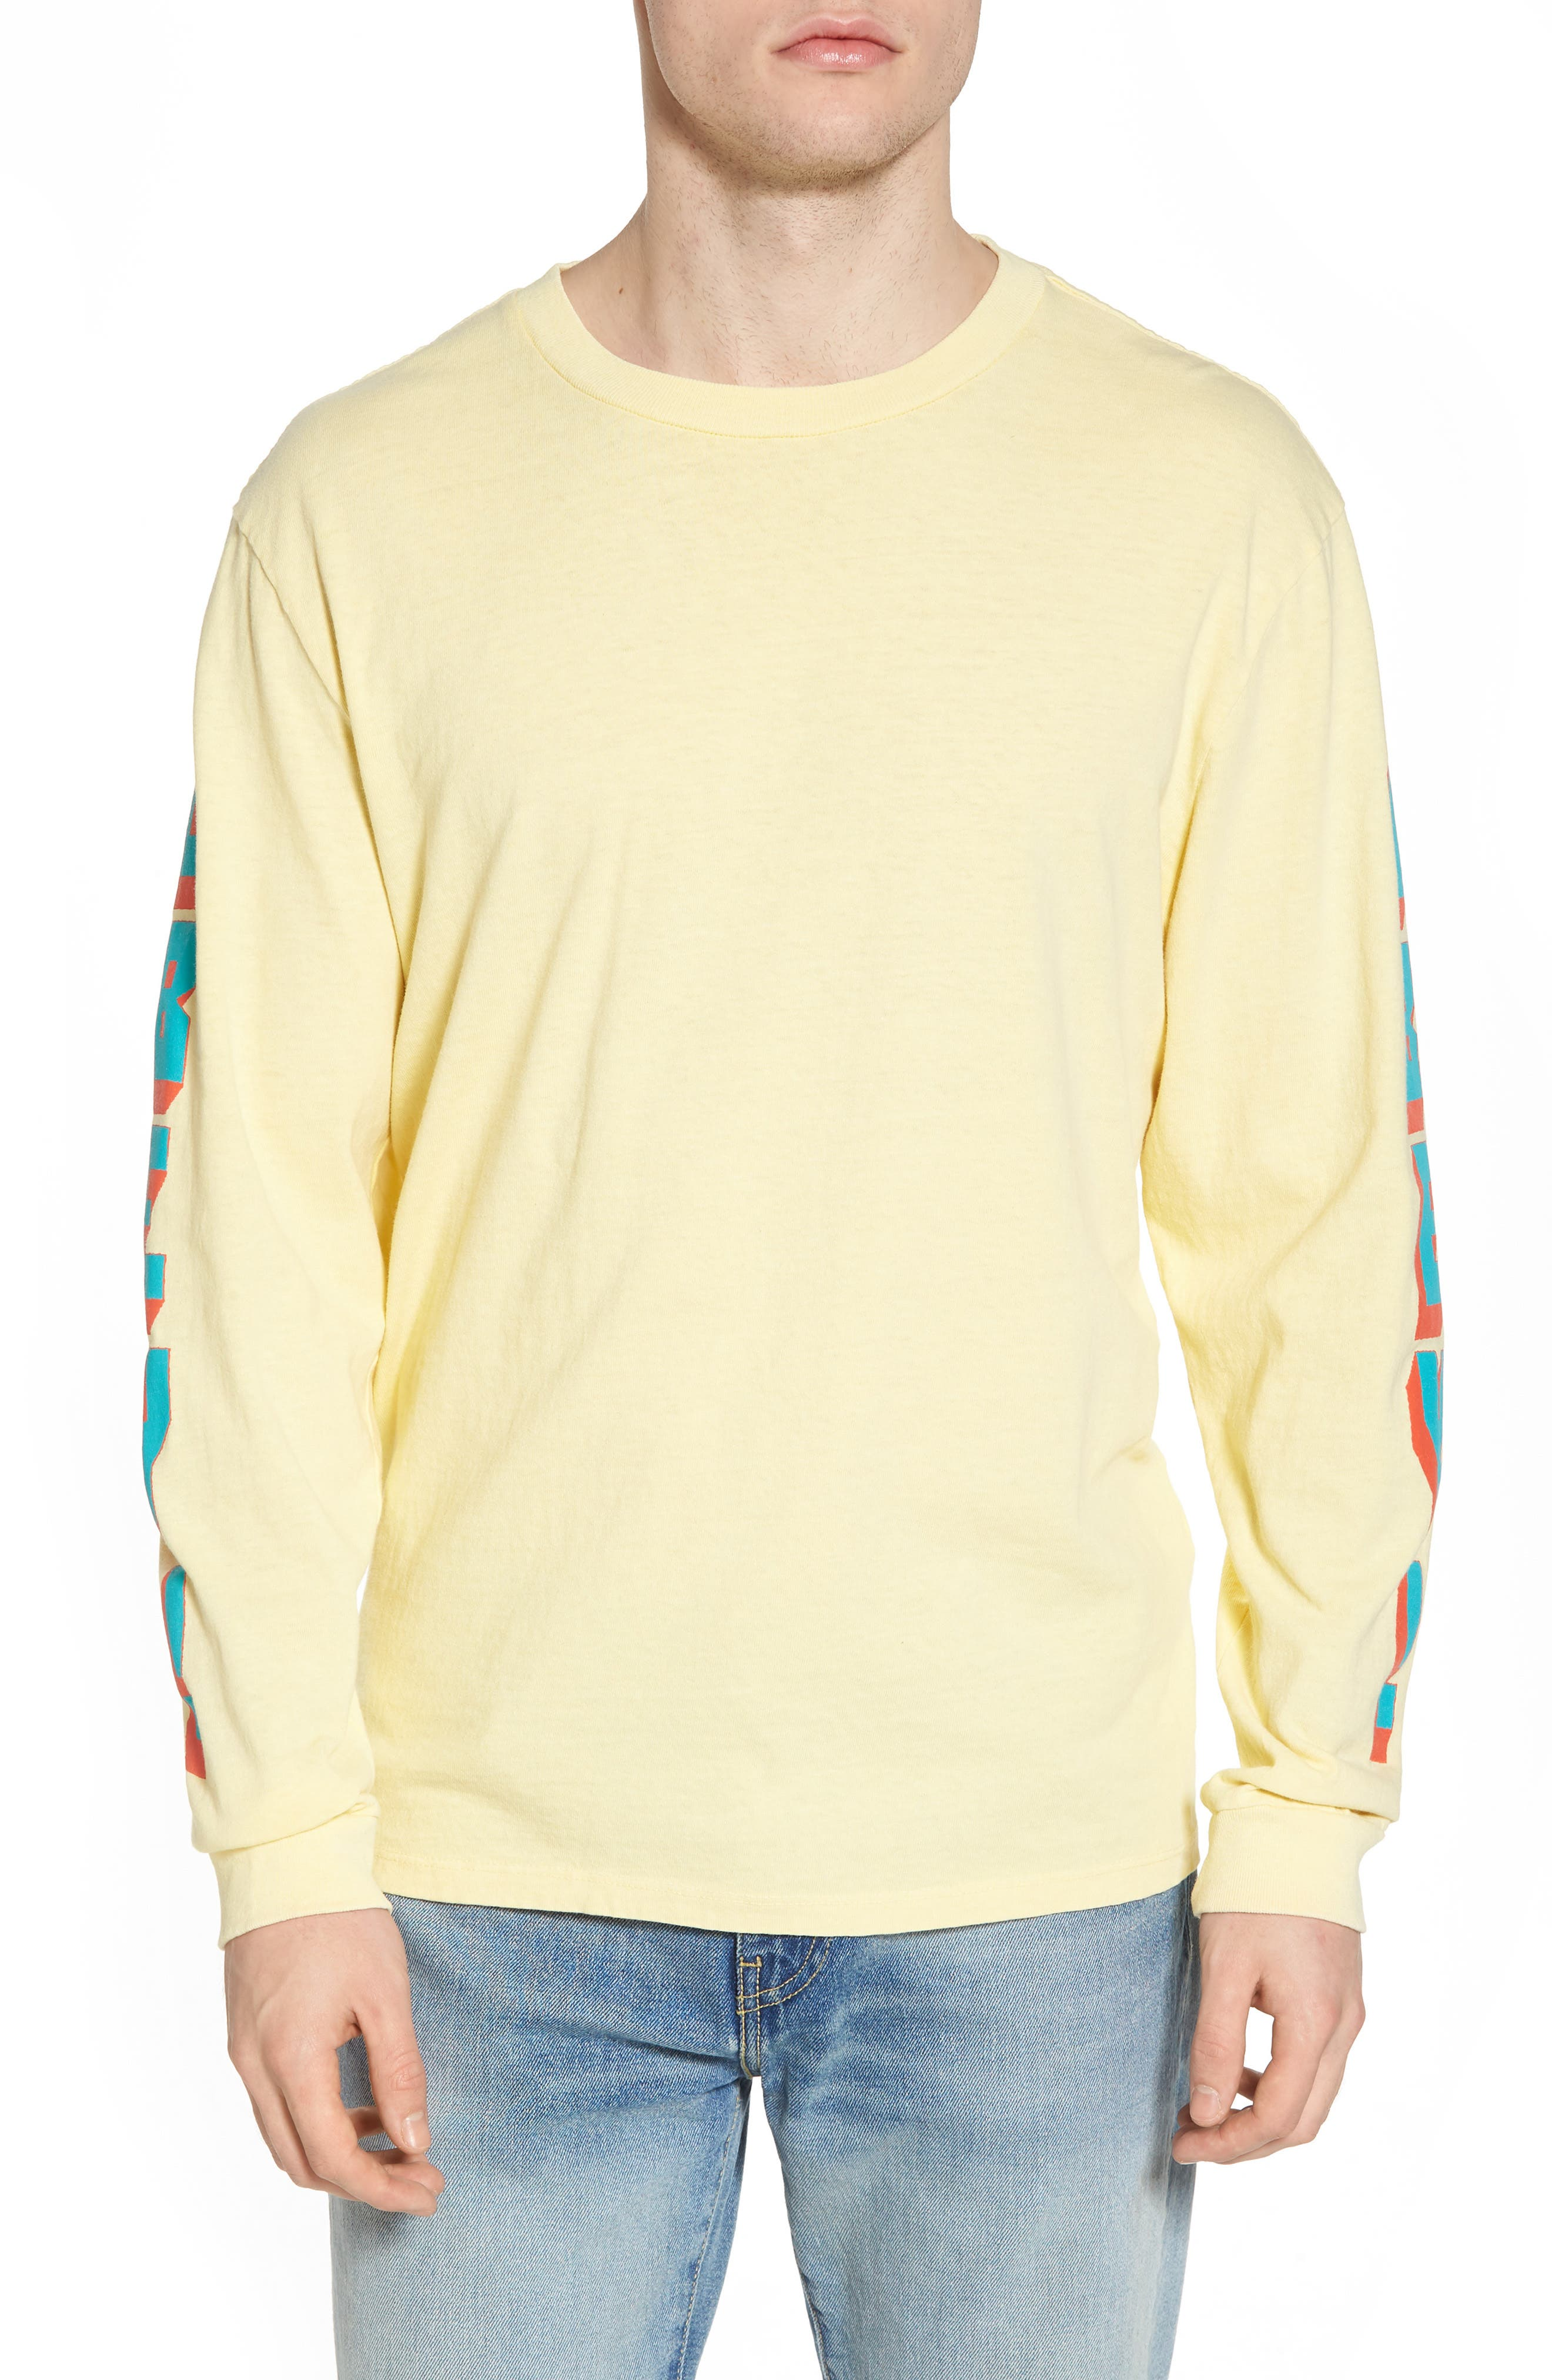 New World II Pigment T-Shirt,                         Main,                         color, Dusty Lemon